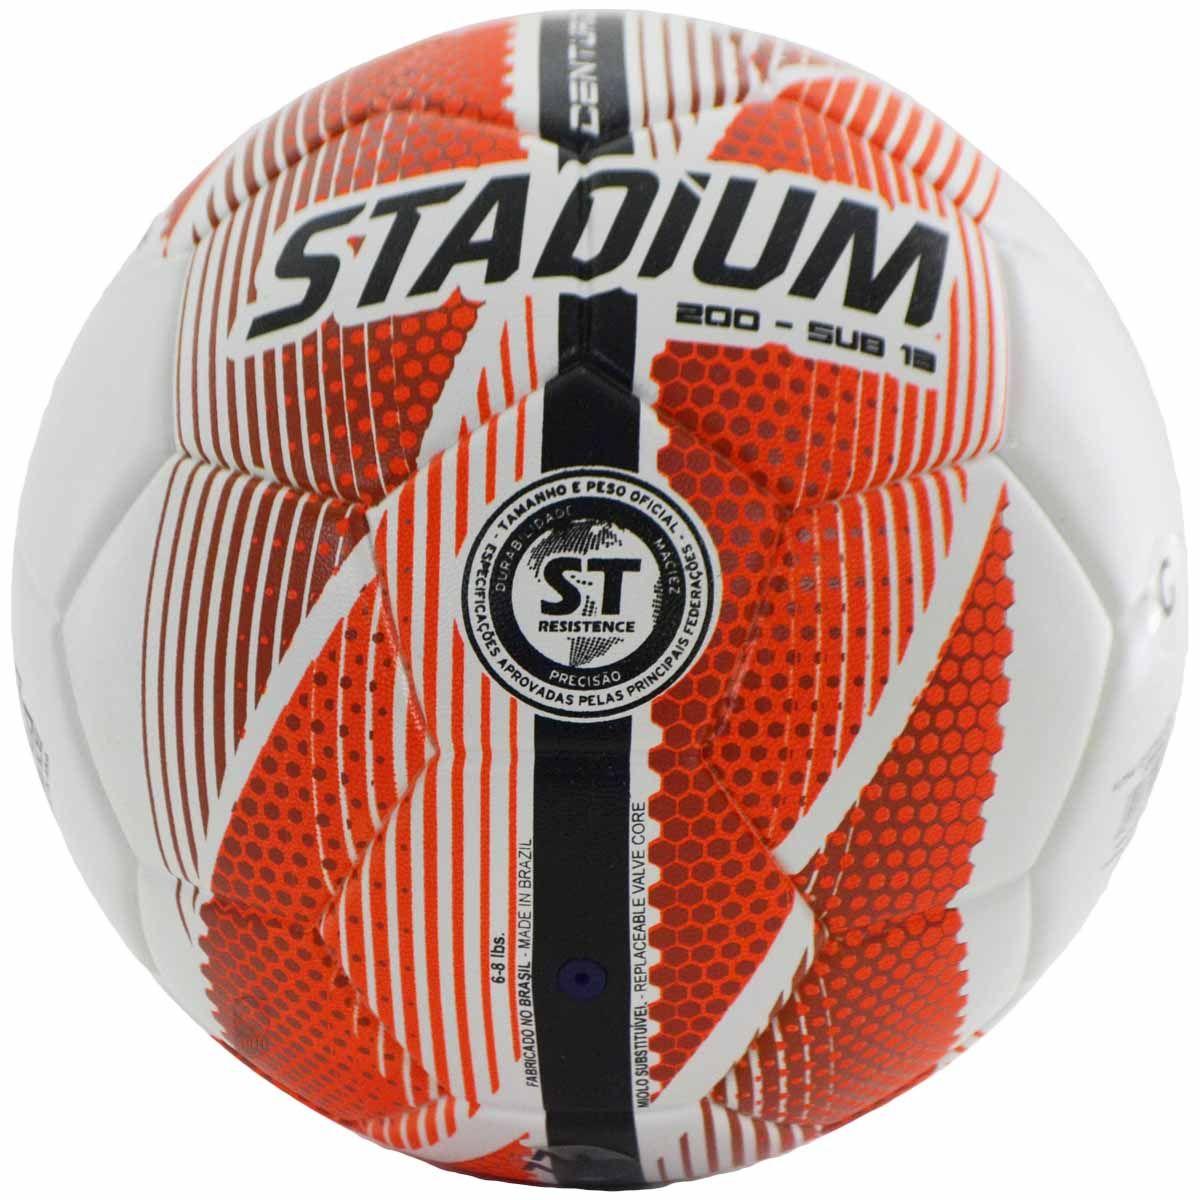 Bola Futsal Infantil Centurion 200 Sub 13 Termotec - Stadium